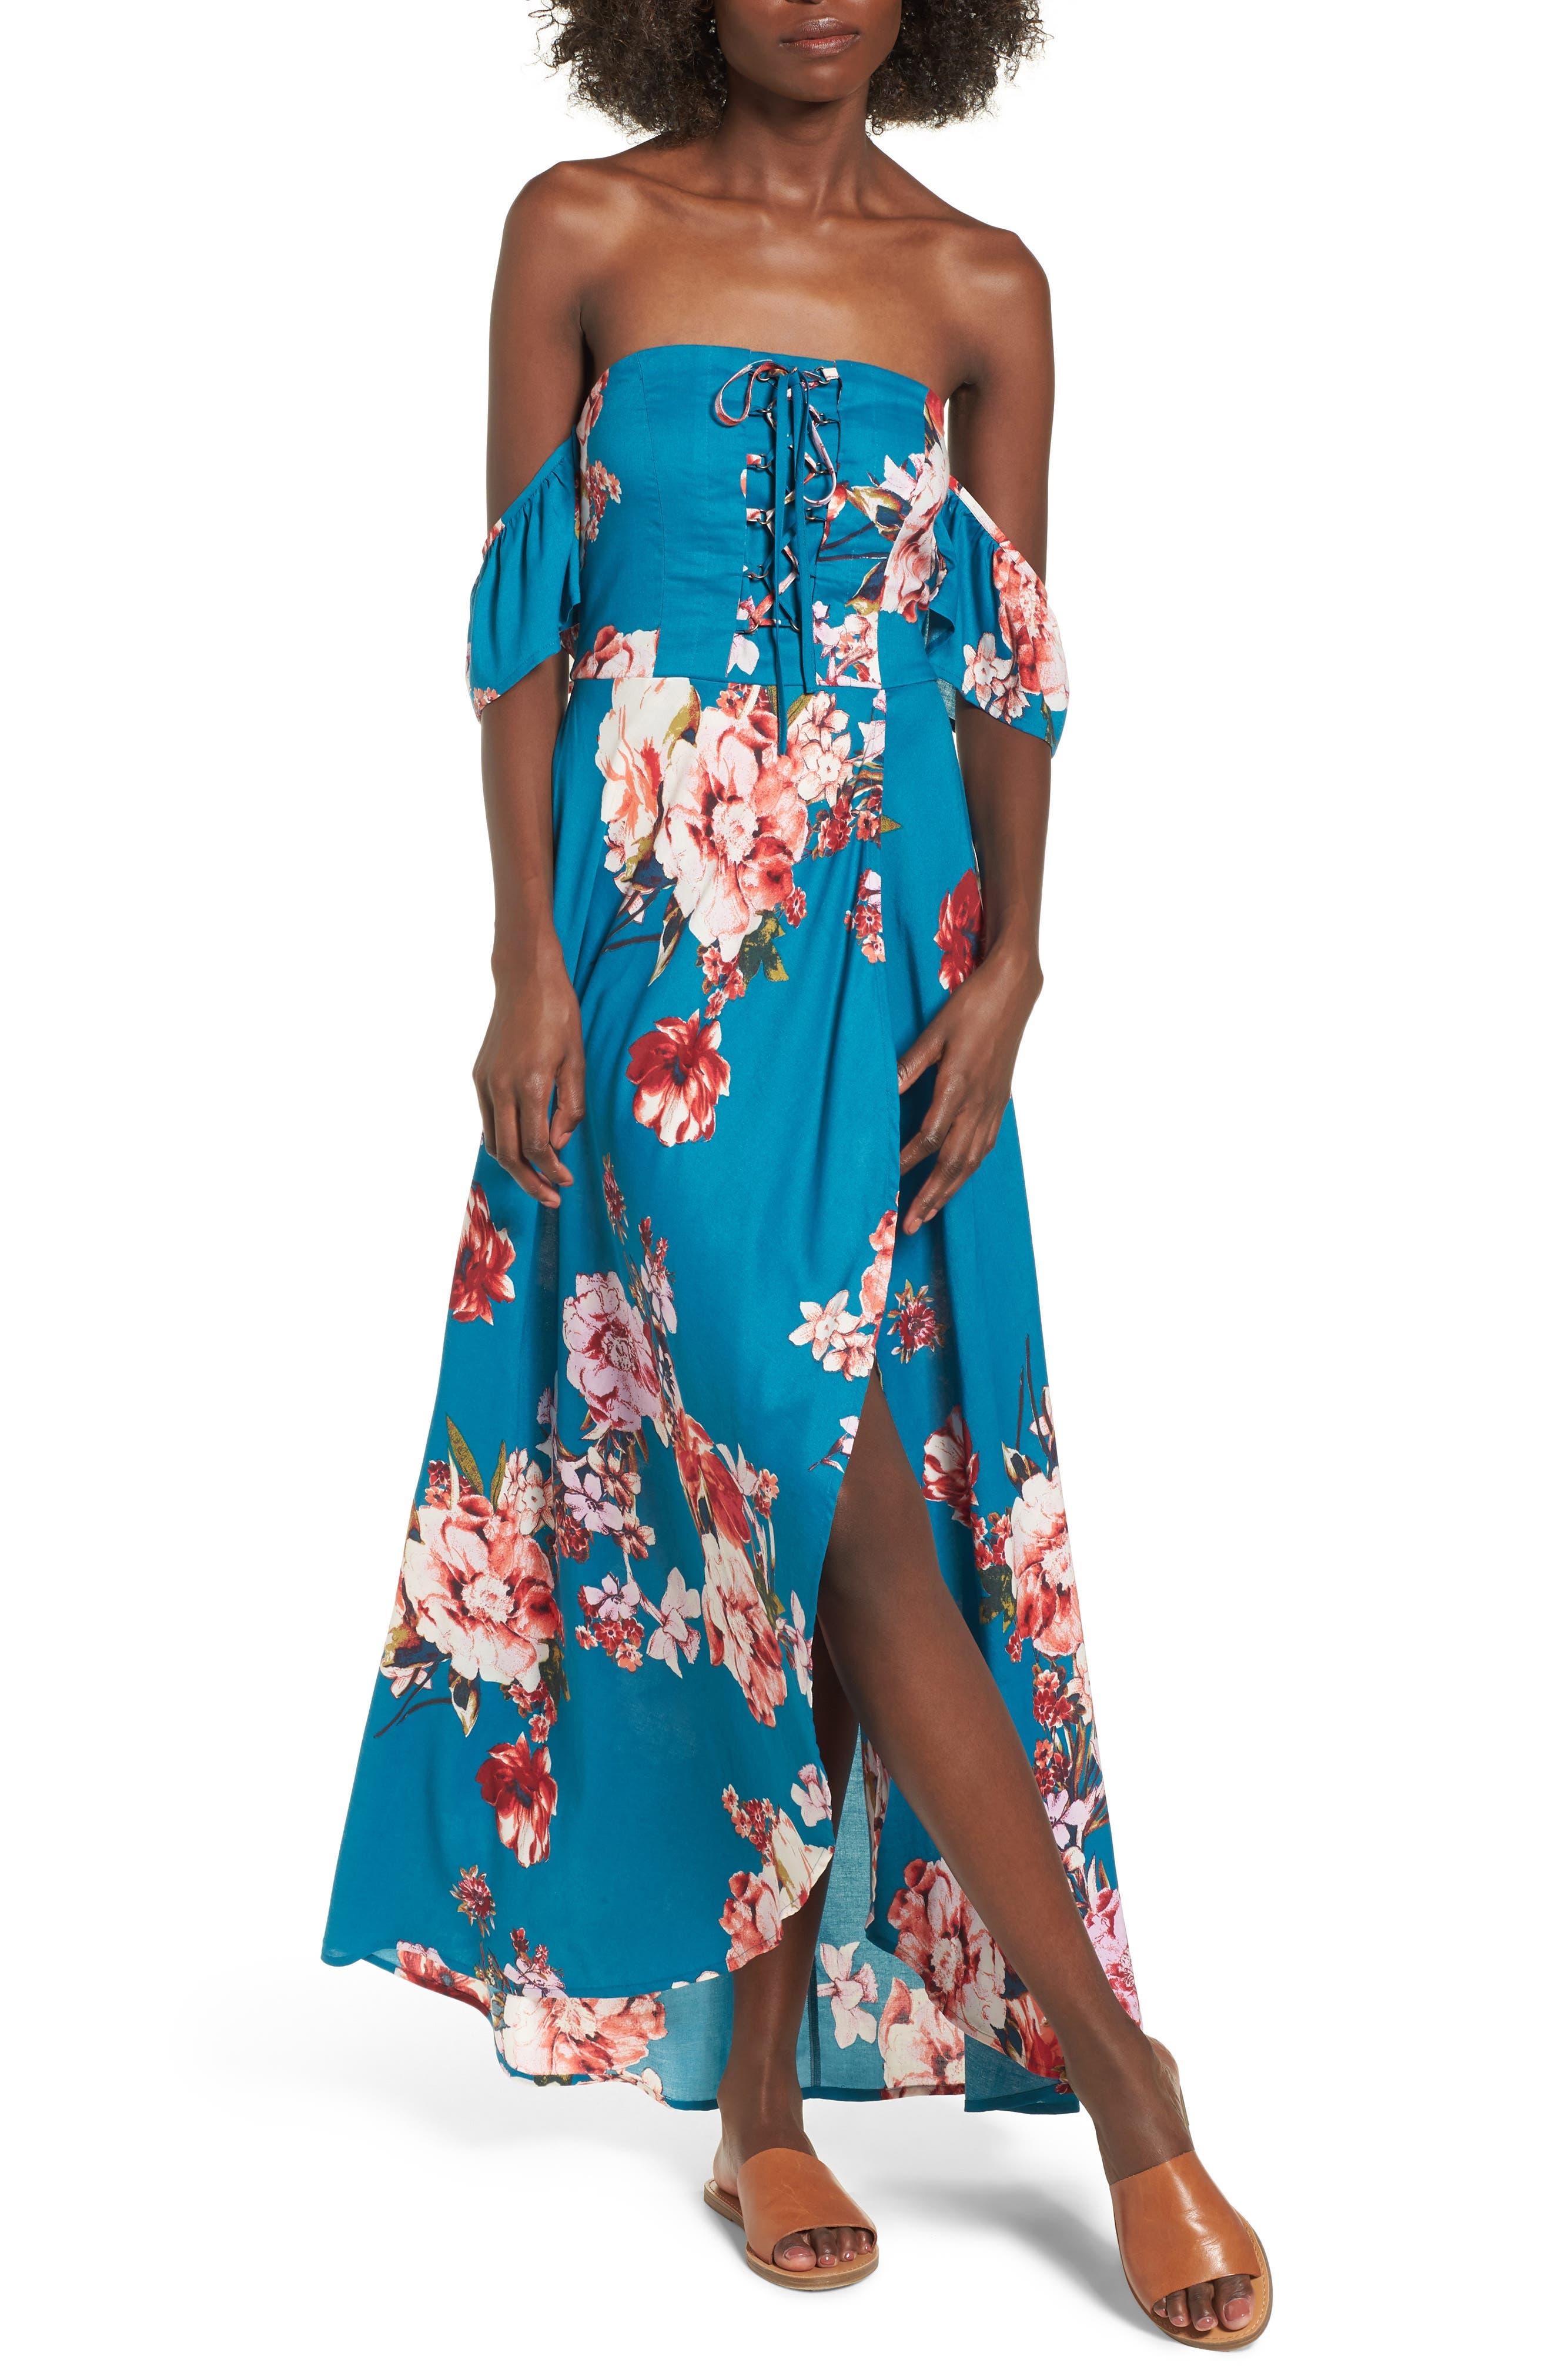 Lace Up Cold Shoulder Maxi Dress,                         Main,                         color, Teal/ Peach